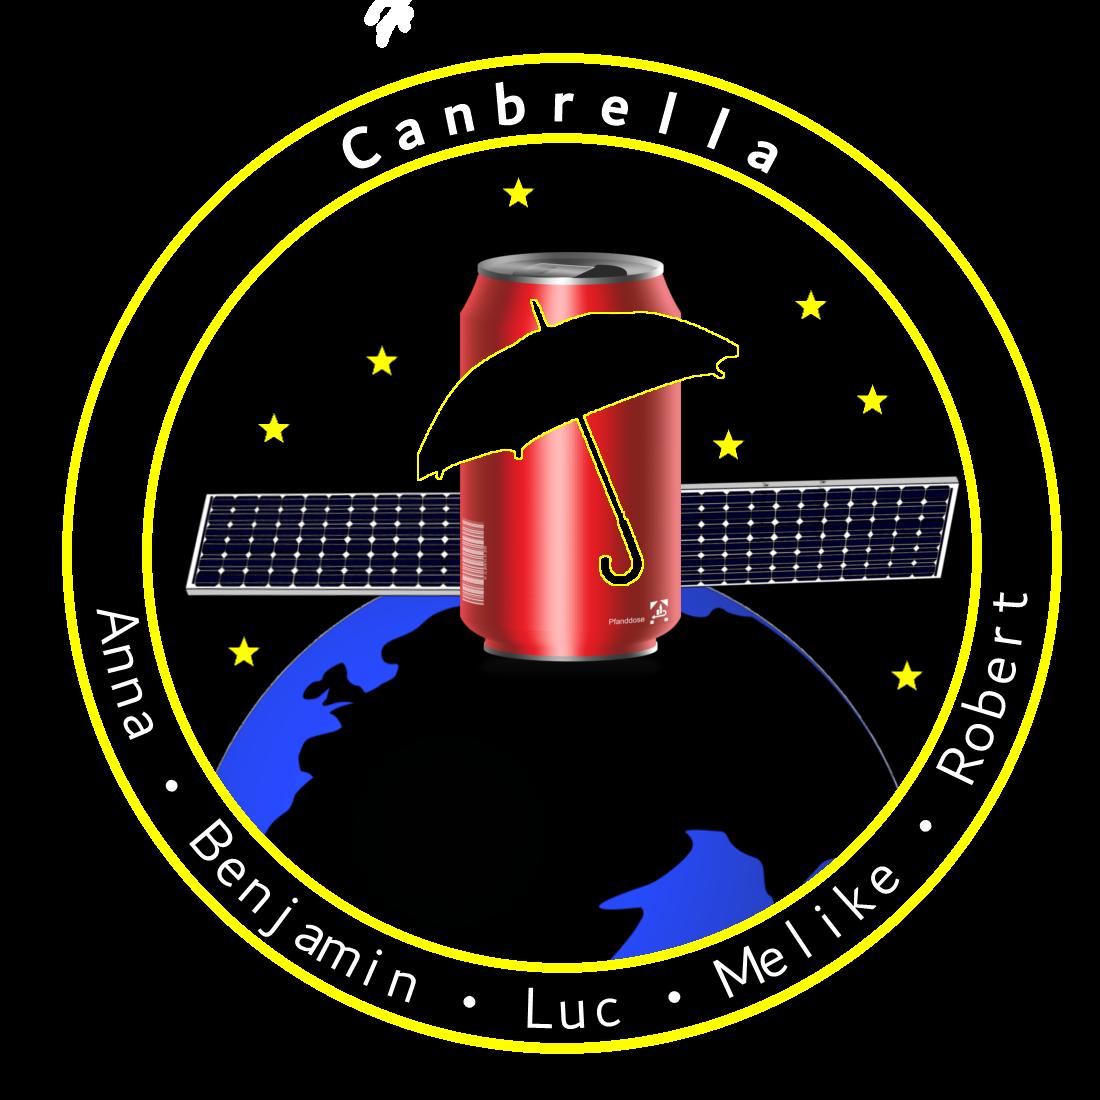 Canbrella (2018/2018)